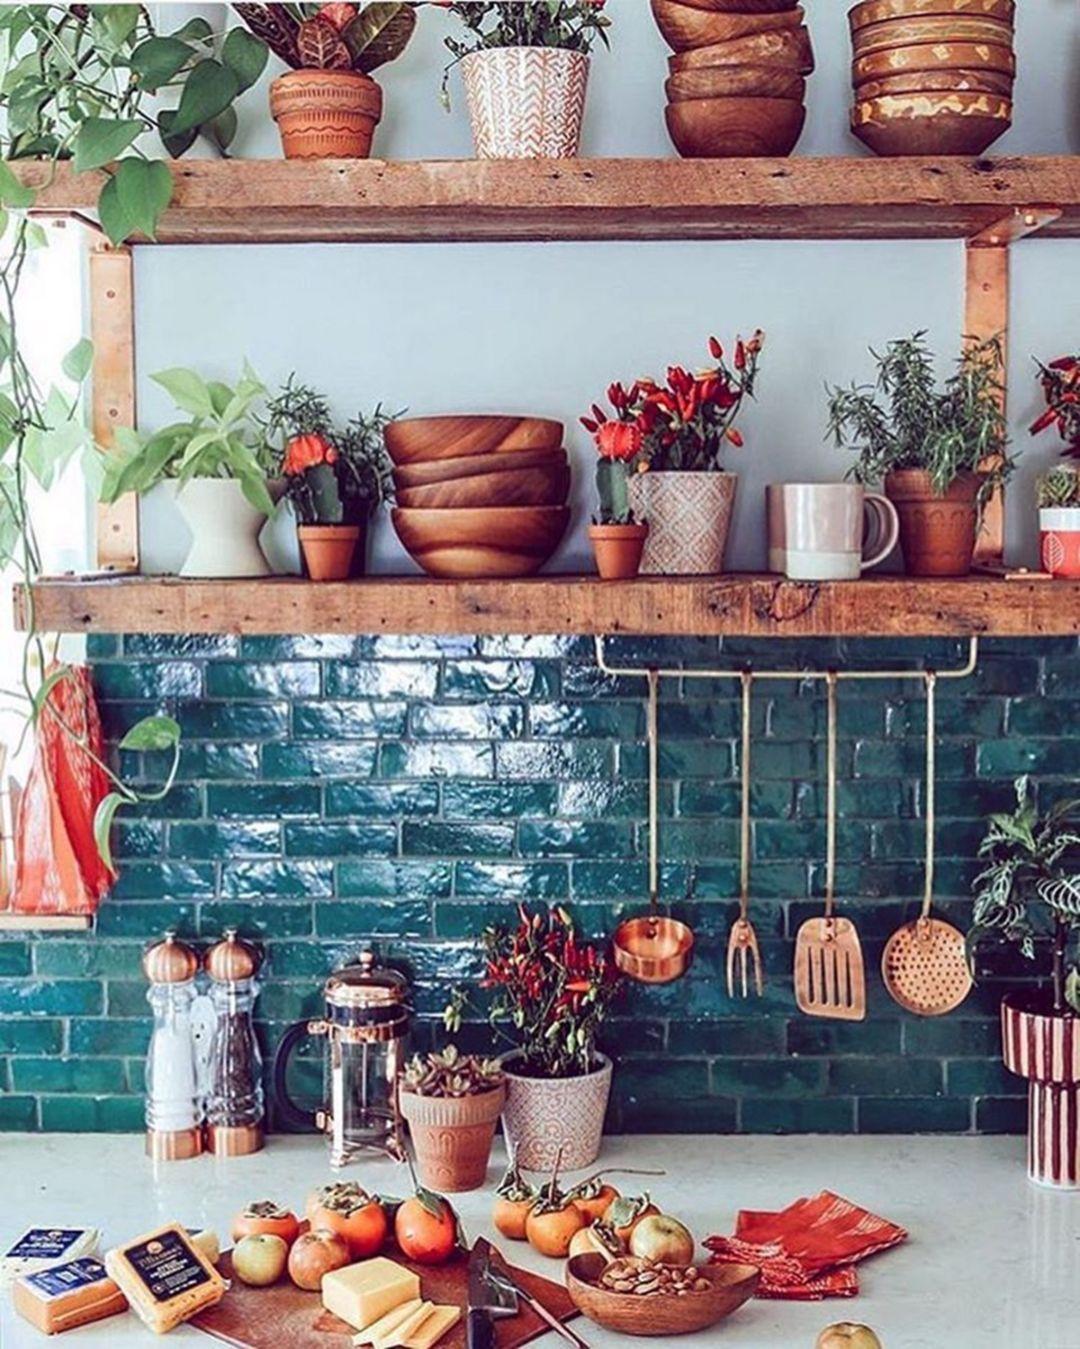 03 Plants in the bohemian kitchen 01